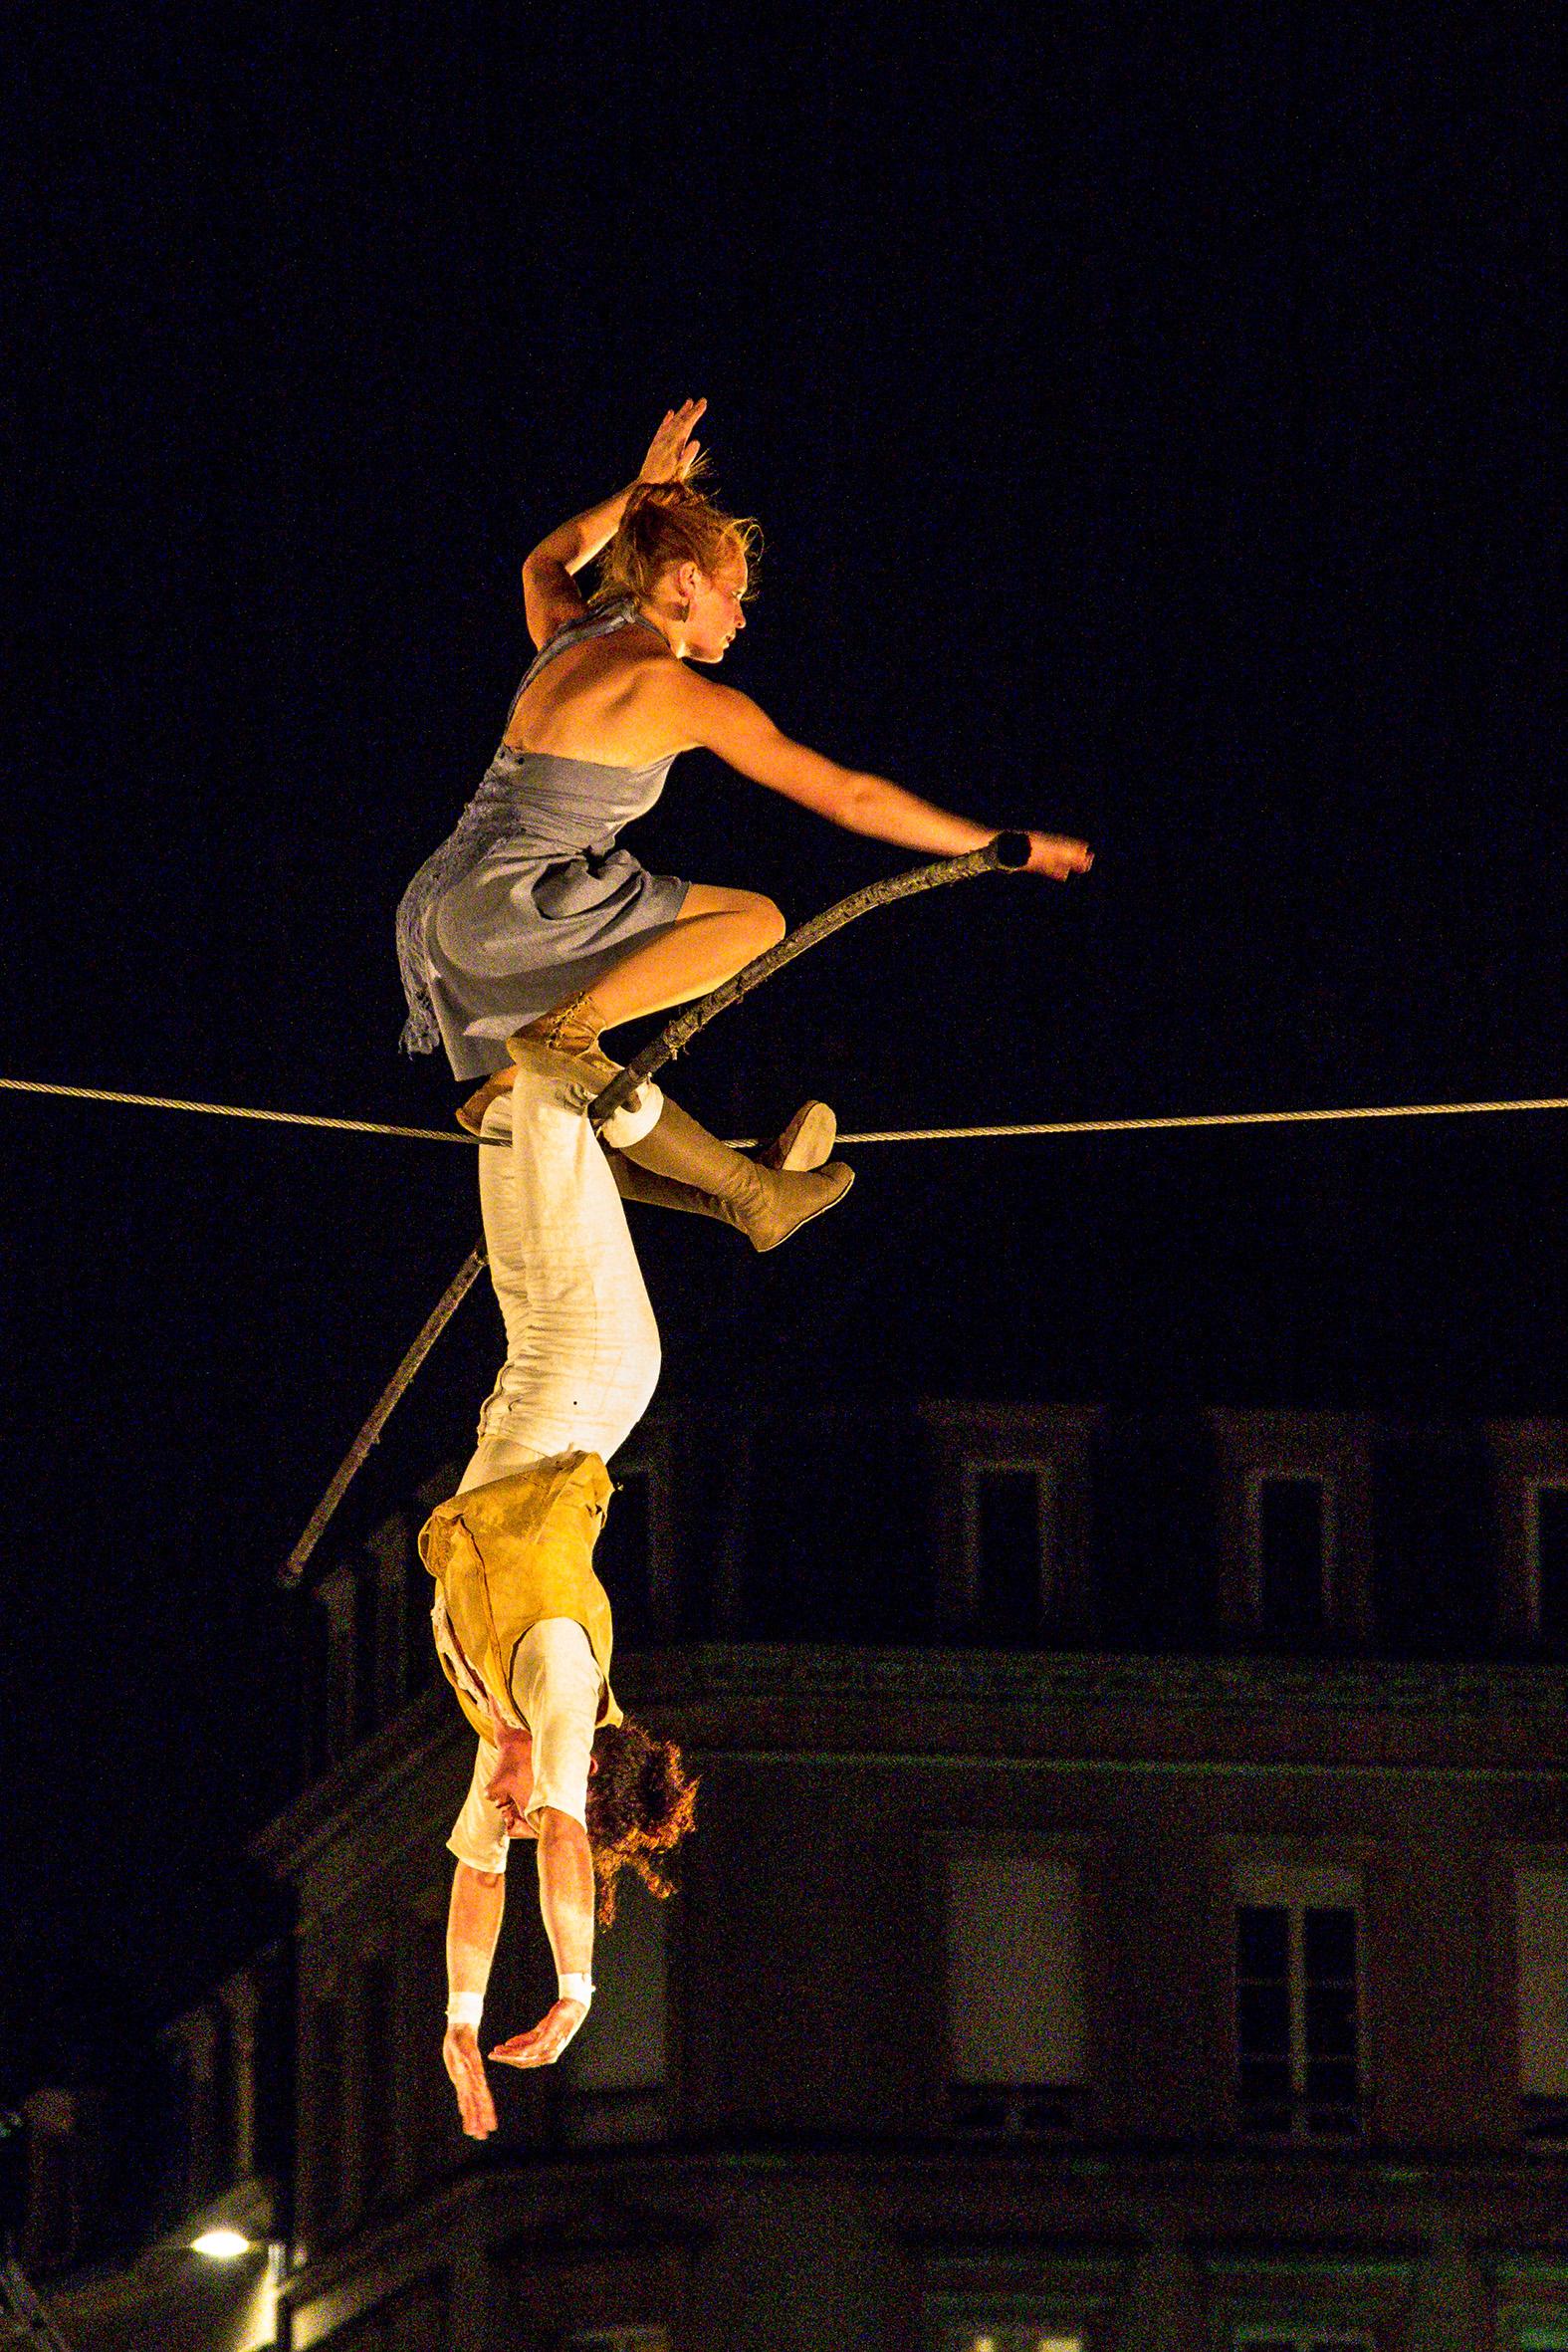 spectacles-sodade-cirque-rouage-mirabelle-metz-2015-marie-colette-becker-02